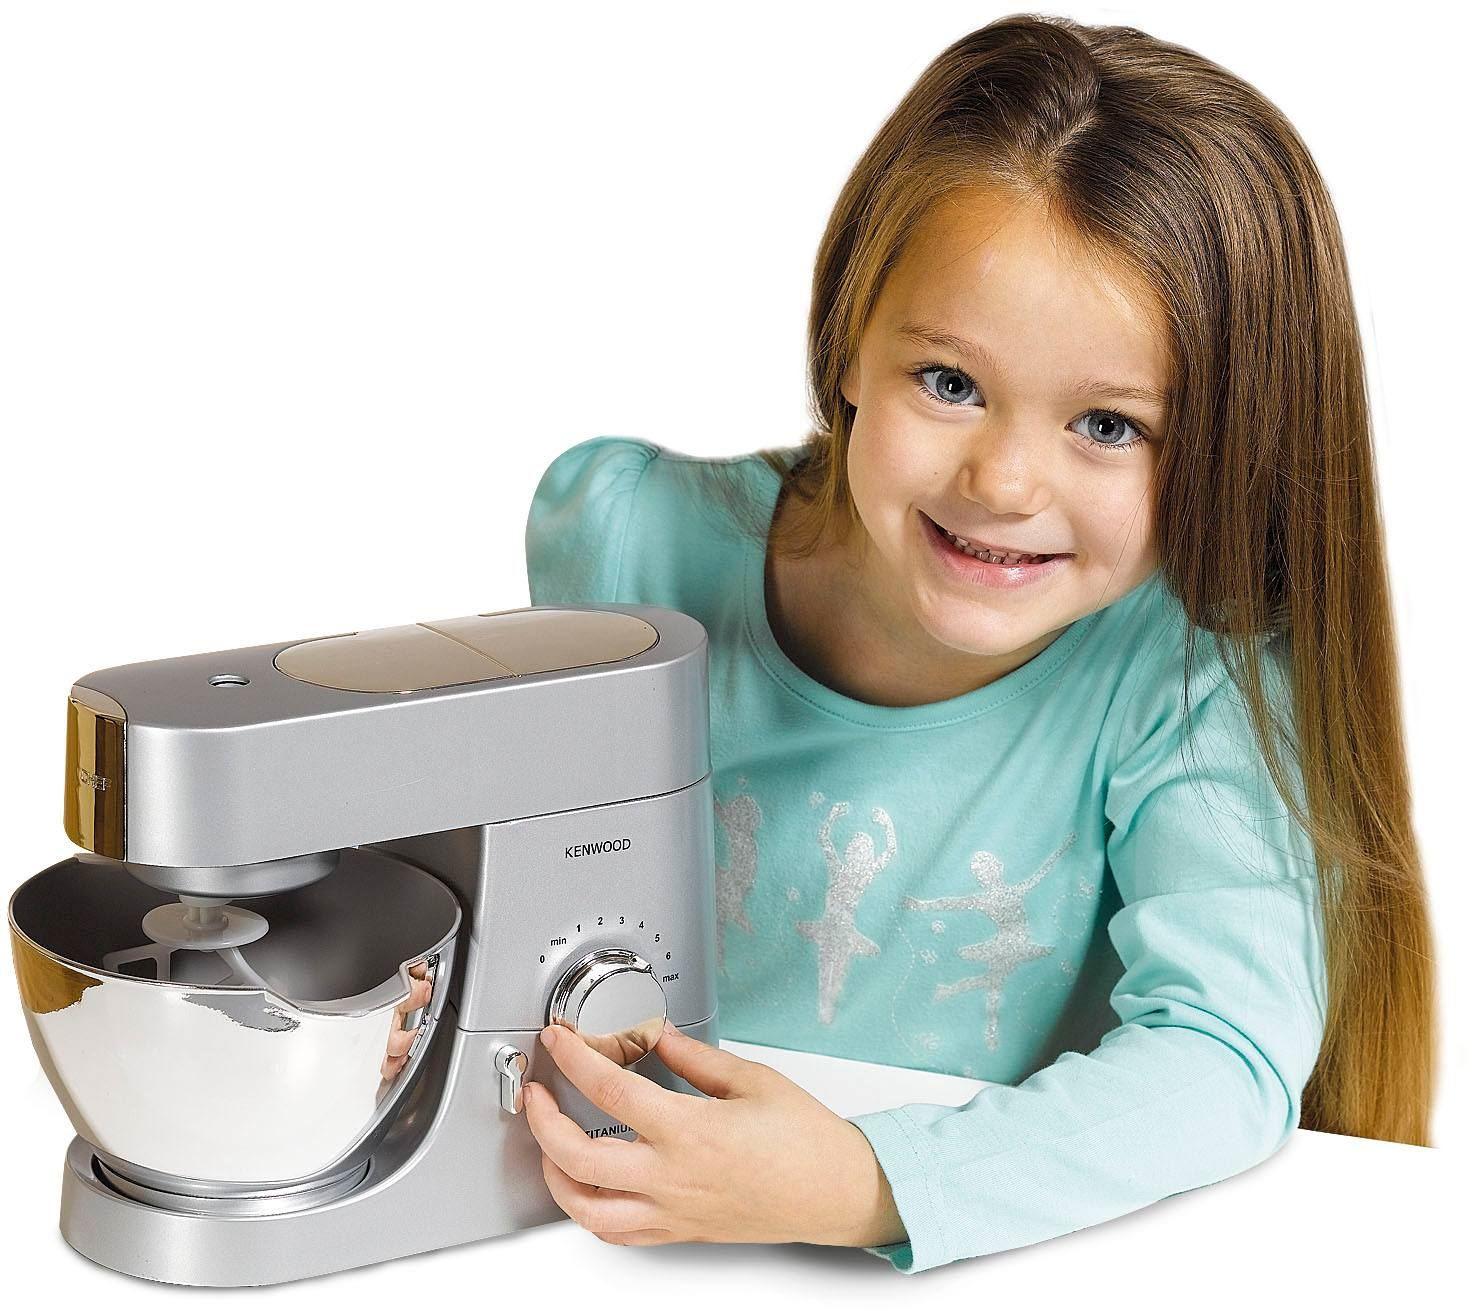 Casdon Little Cook Kenwood Titanium Mixer Role Play Kids Kitchen Toy ...